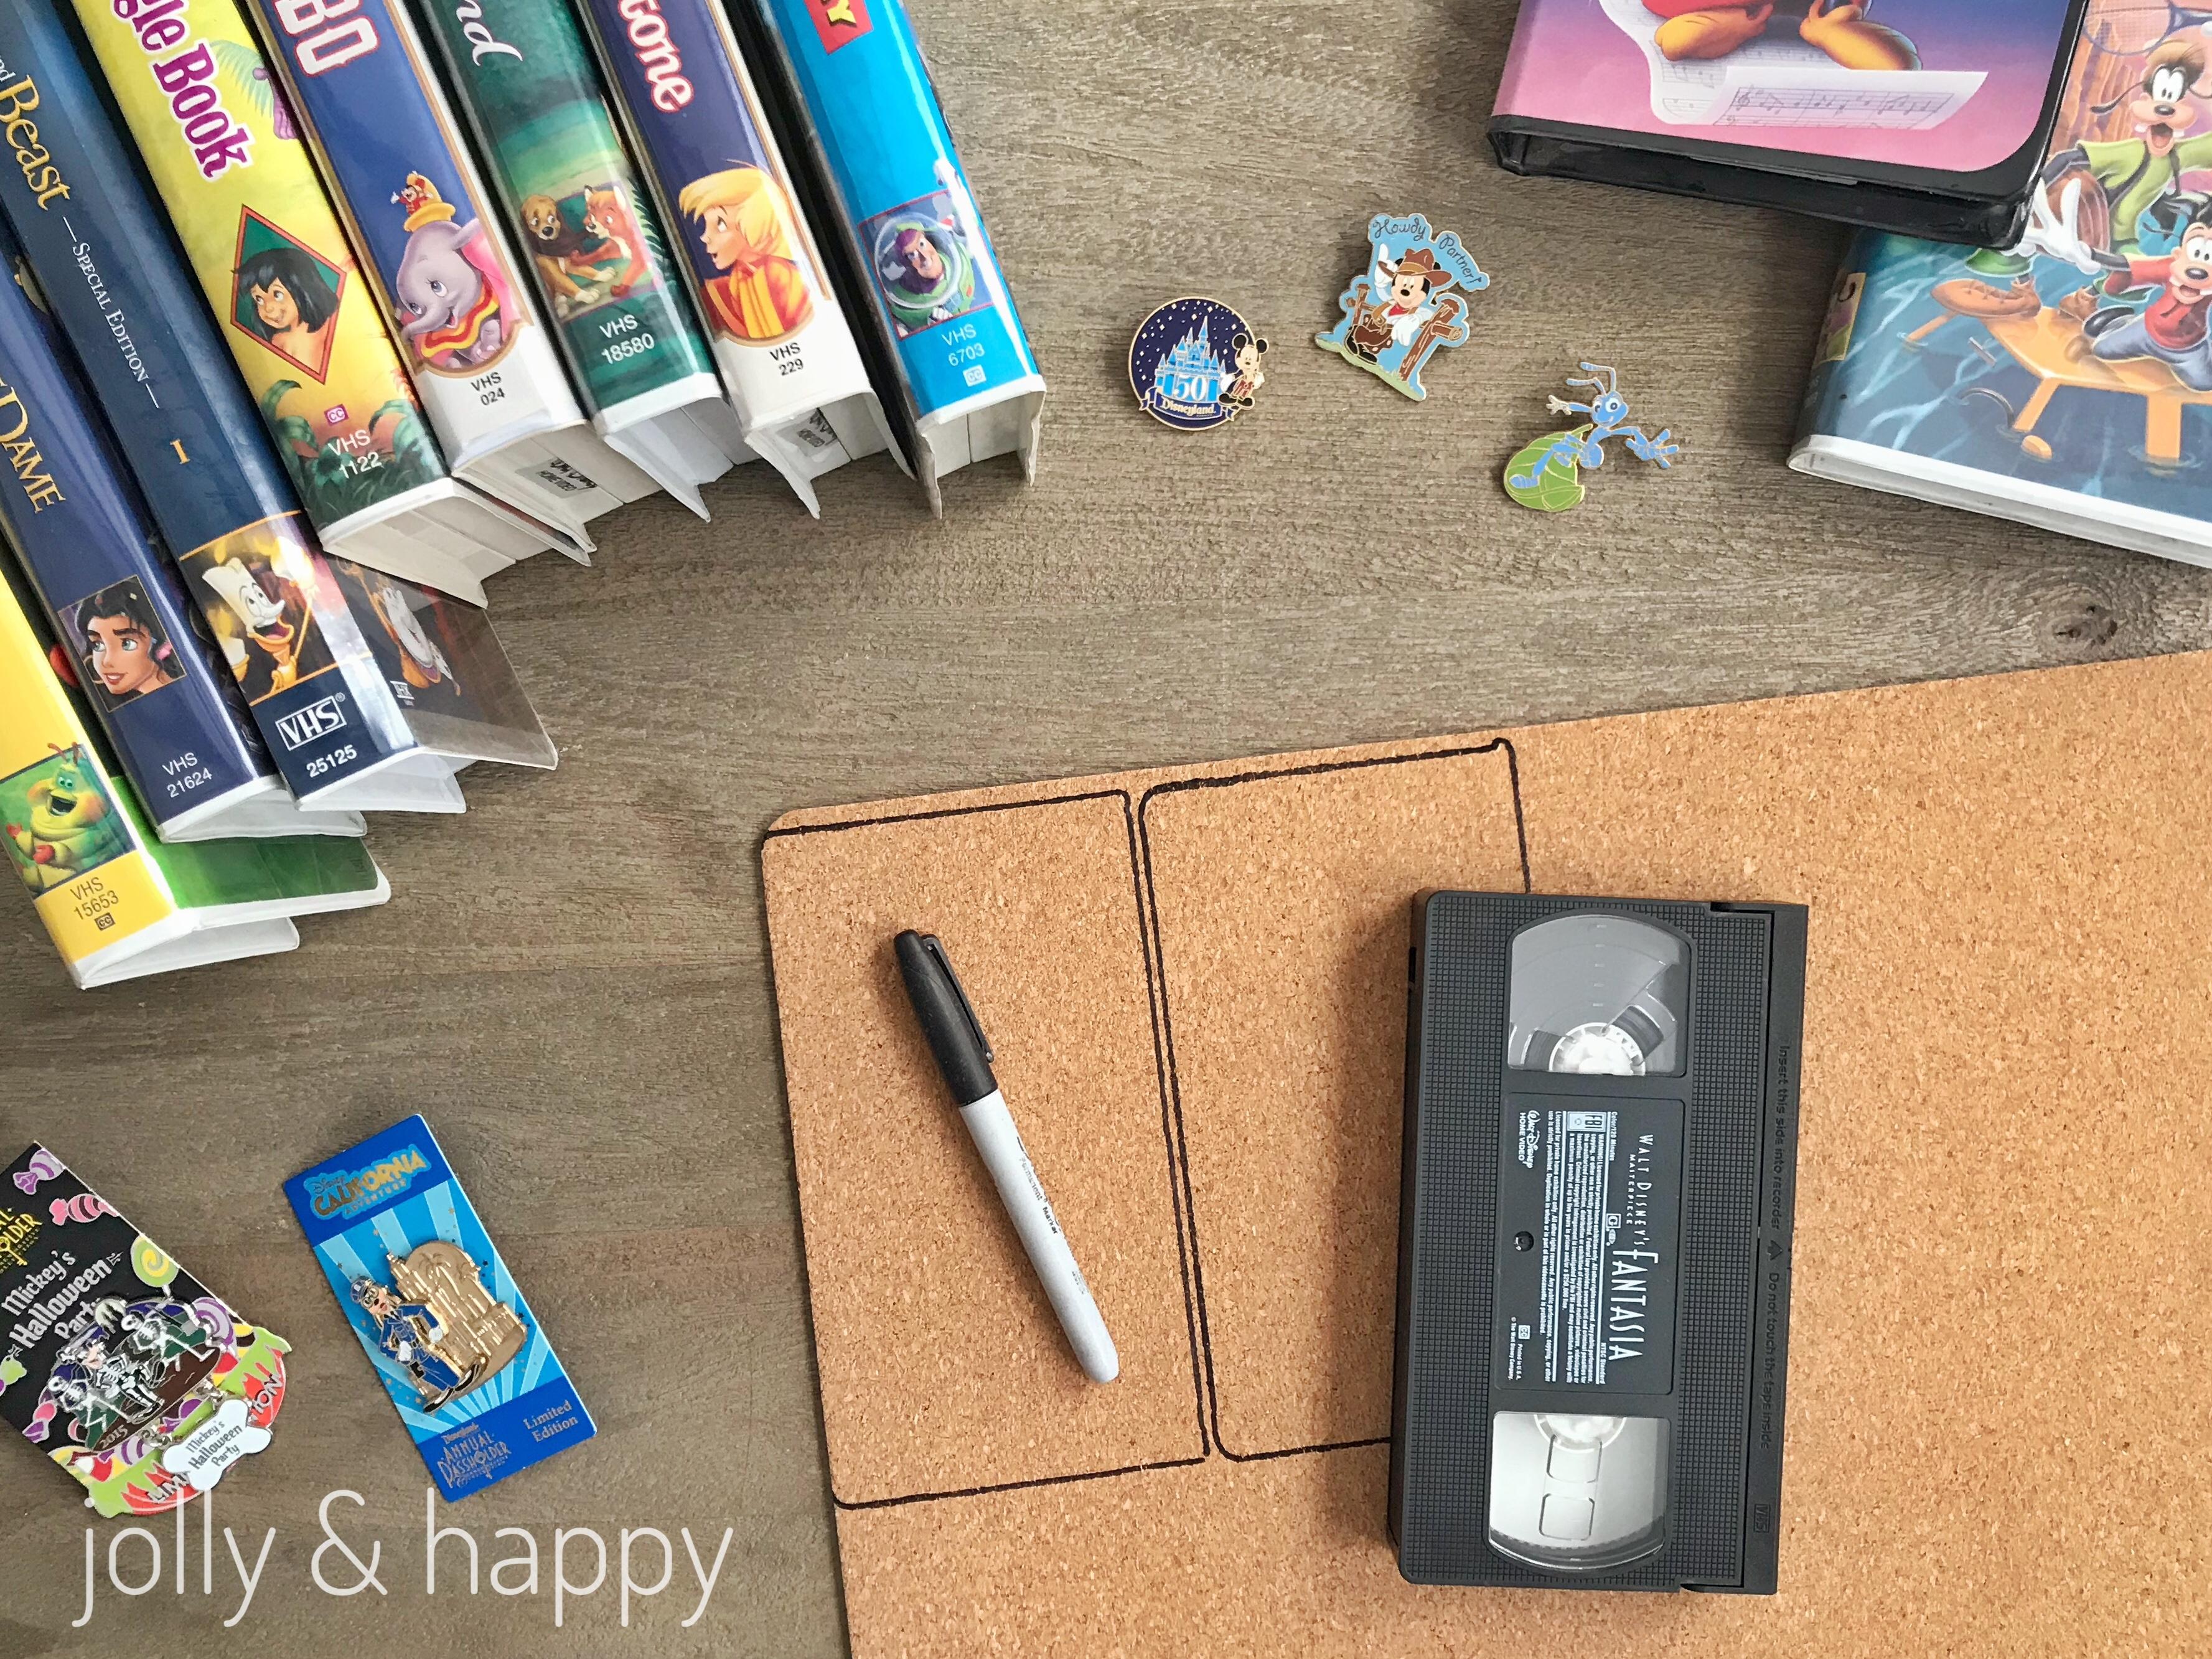 Disney VHS clamshell